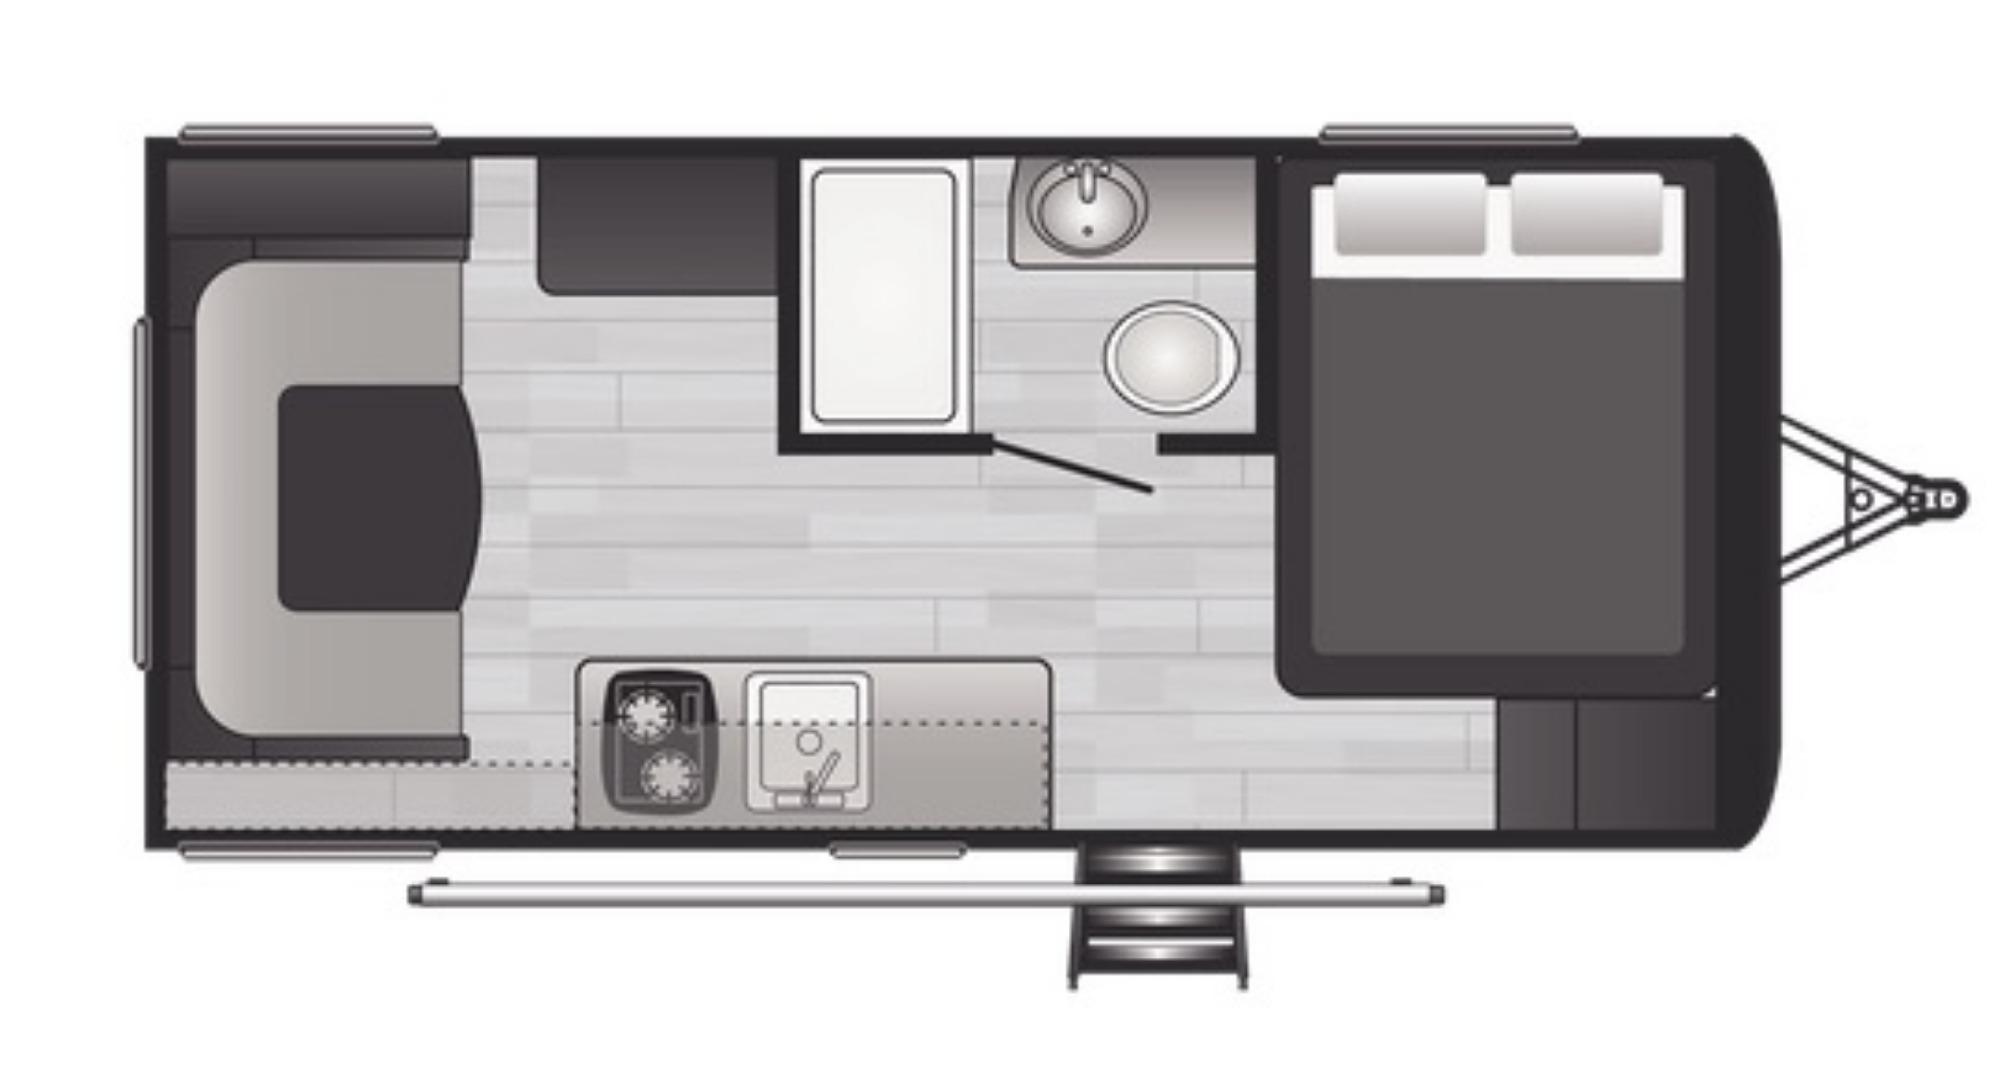 View Floor Plan for 2022 KEYSTONE HIDEOUT 177RD